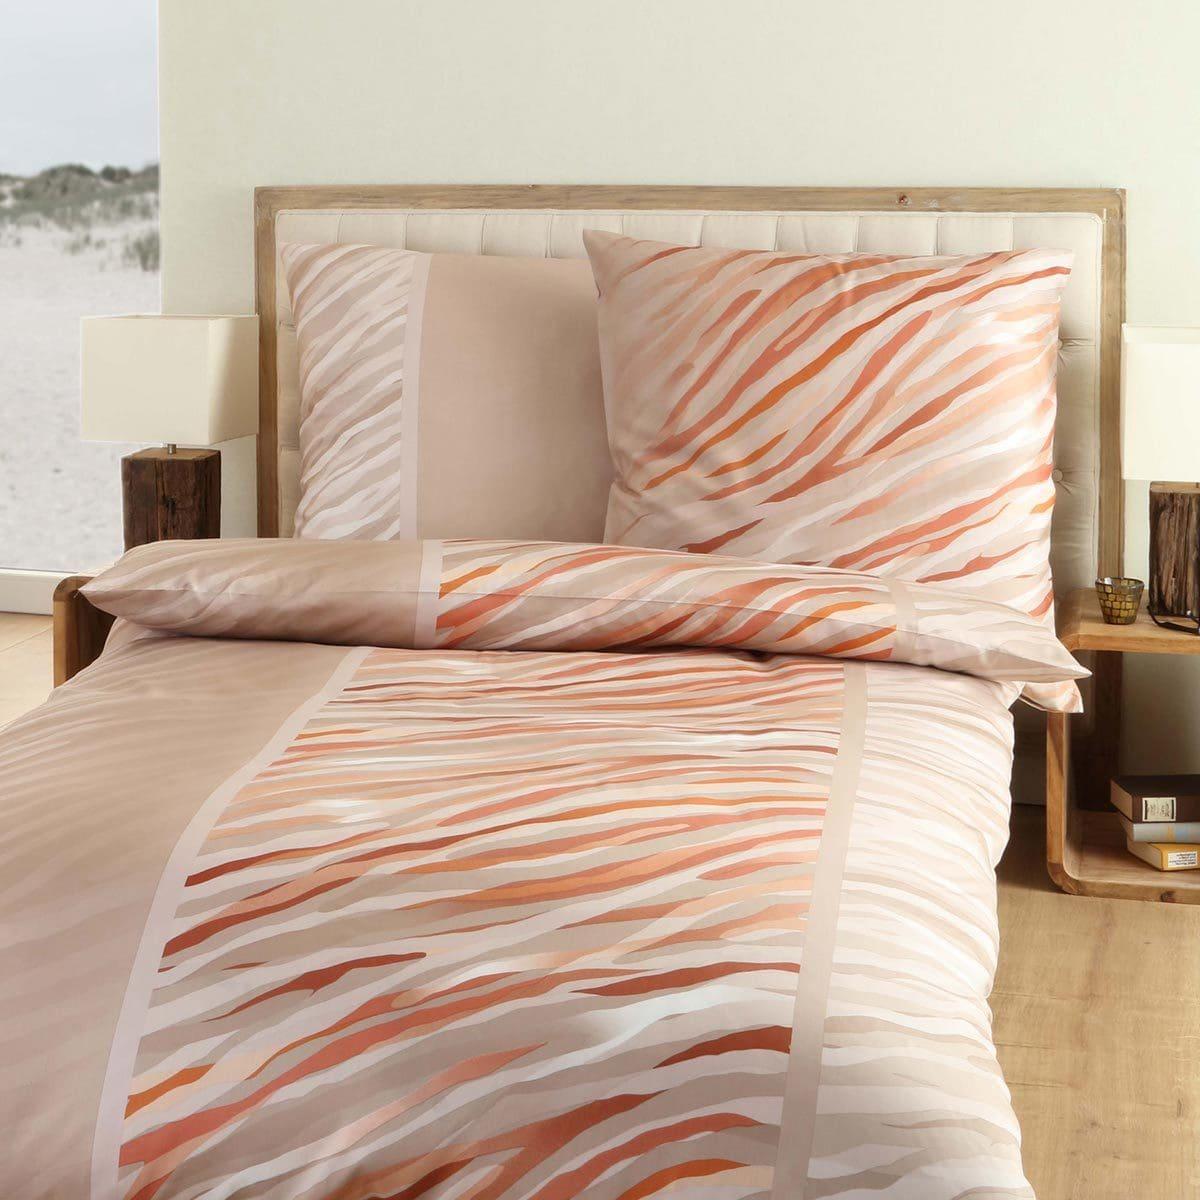 kaeppel mako satin bettw sche zola mandel g nstig online kaufen bei bettwaren shop. Black Bedroom Furniture Sets. Home Design Ideas